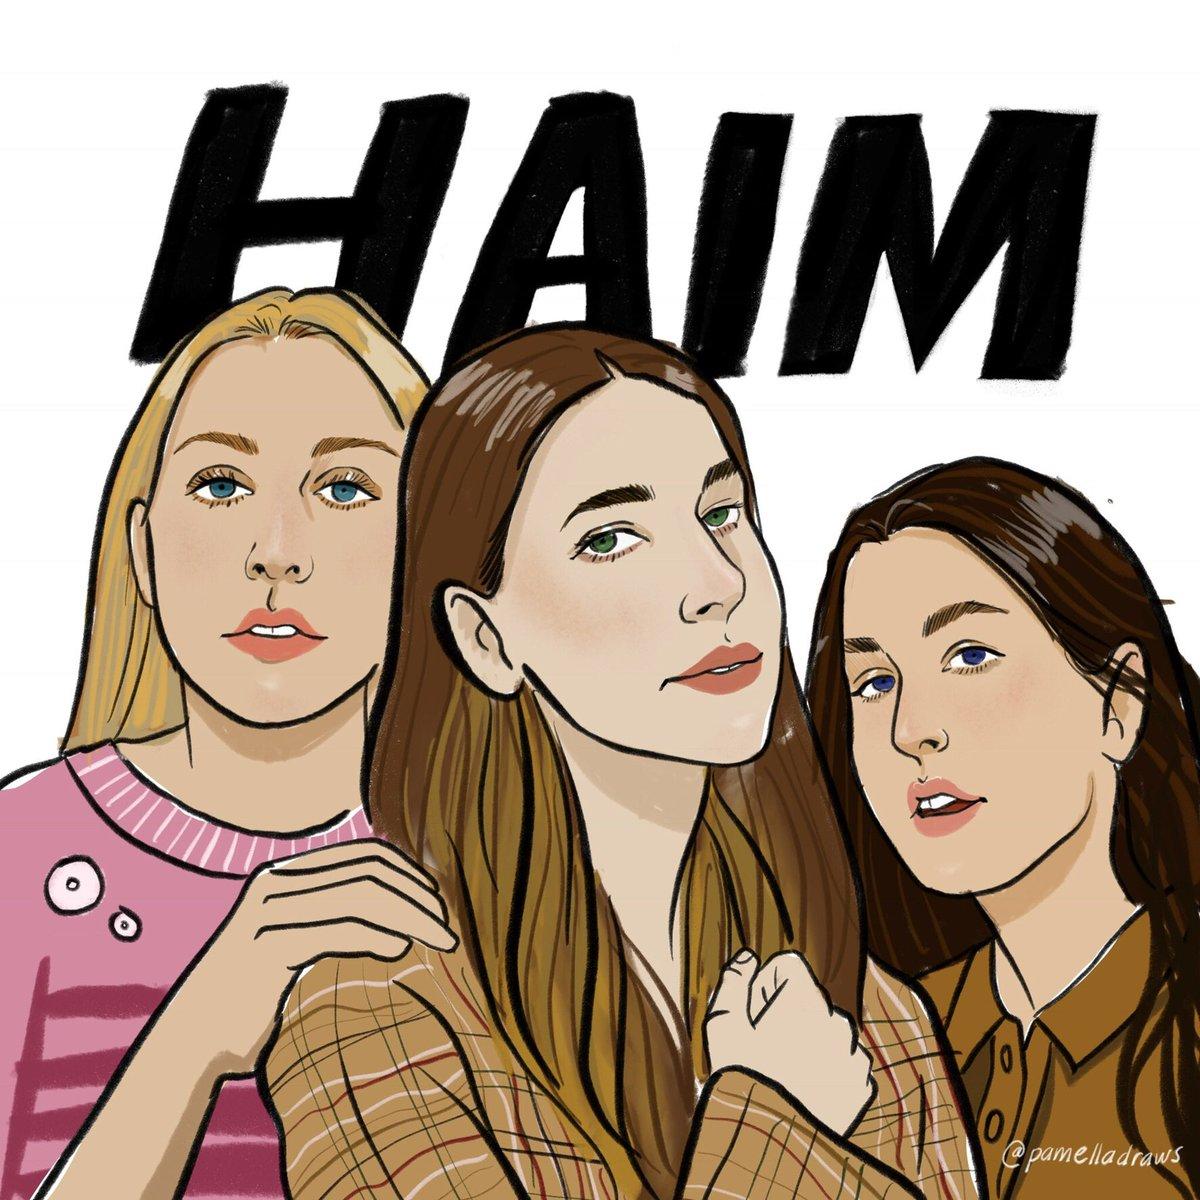 I made a little drawing of these badasses @HAIMtheband @jizziemcguire @babyhaim  #Haim <br>http://pic.twitter.com/Mxm7S5vFrf